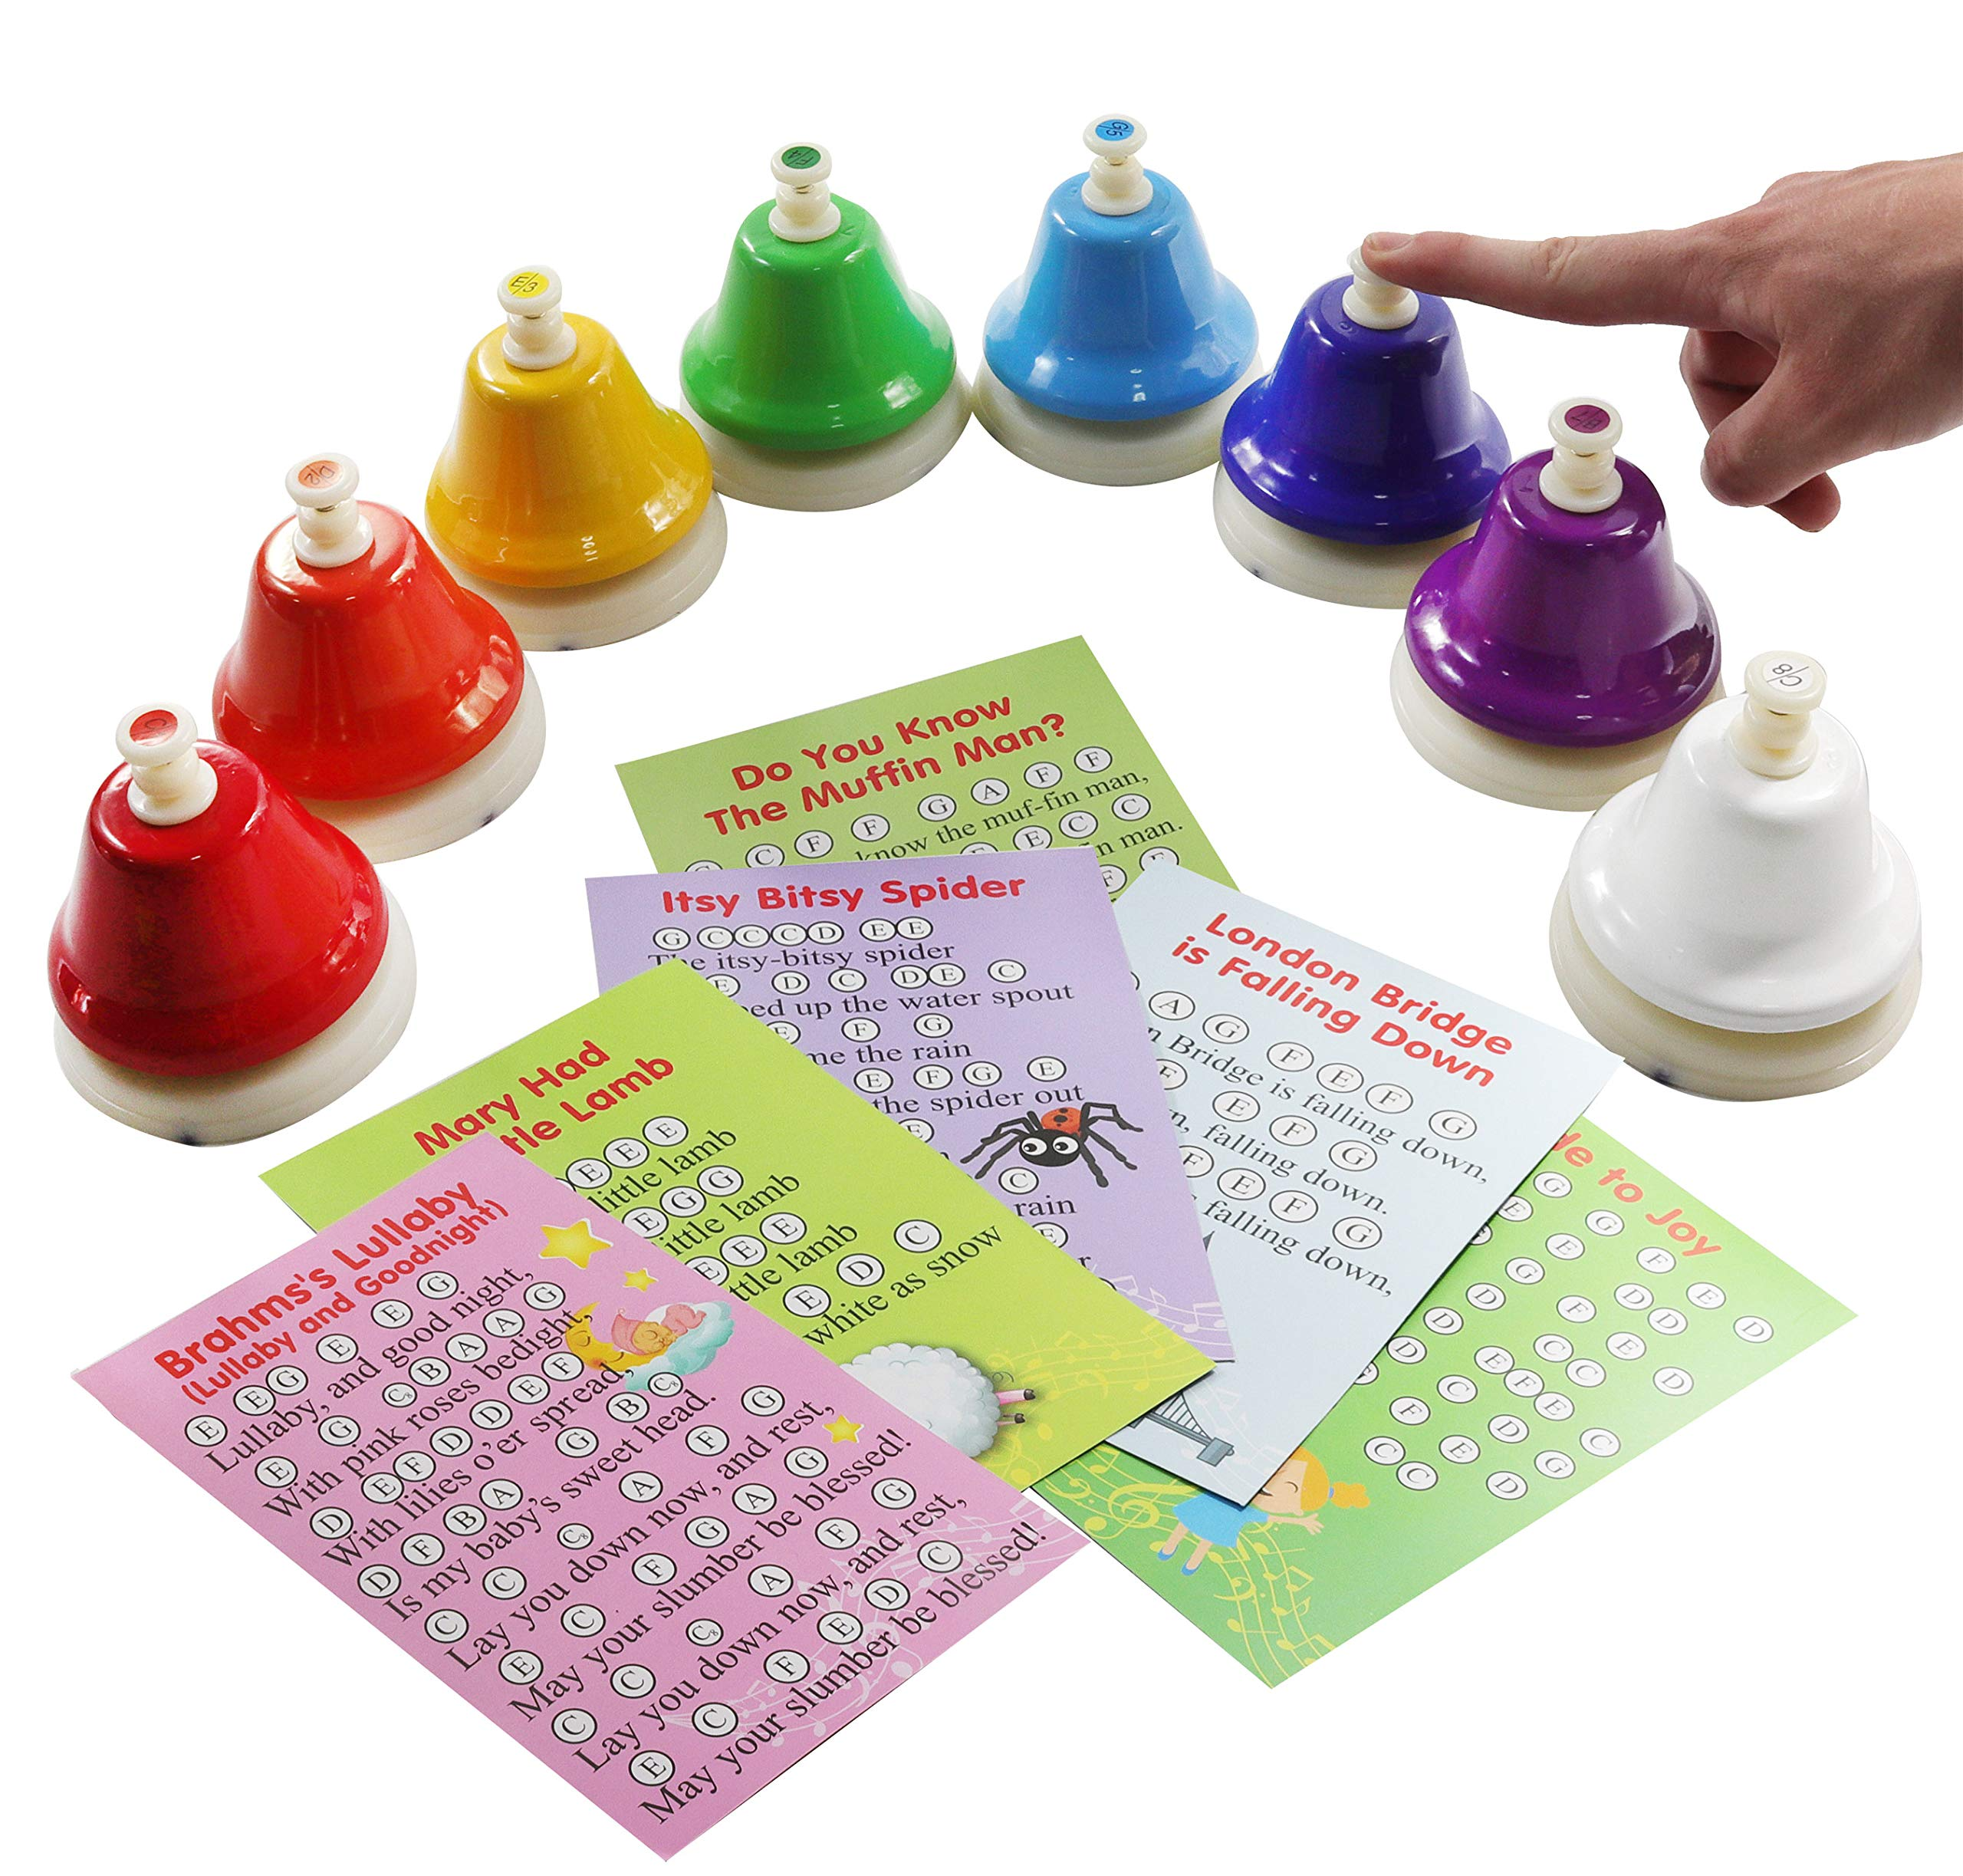 8-note Color Desk Bell Set by inTemenos